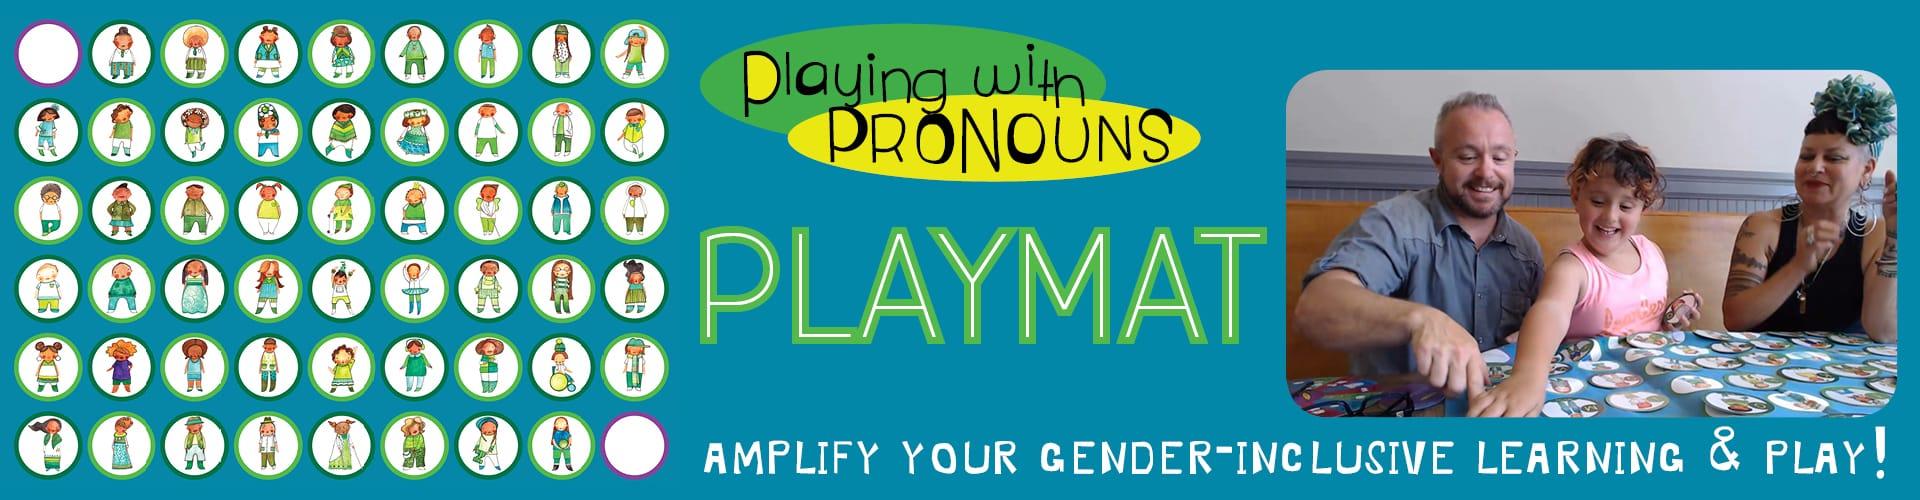 Playing with Pronouns Playmat